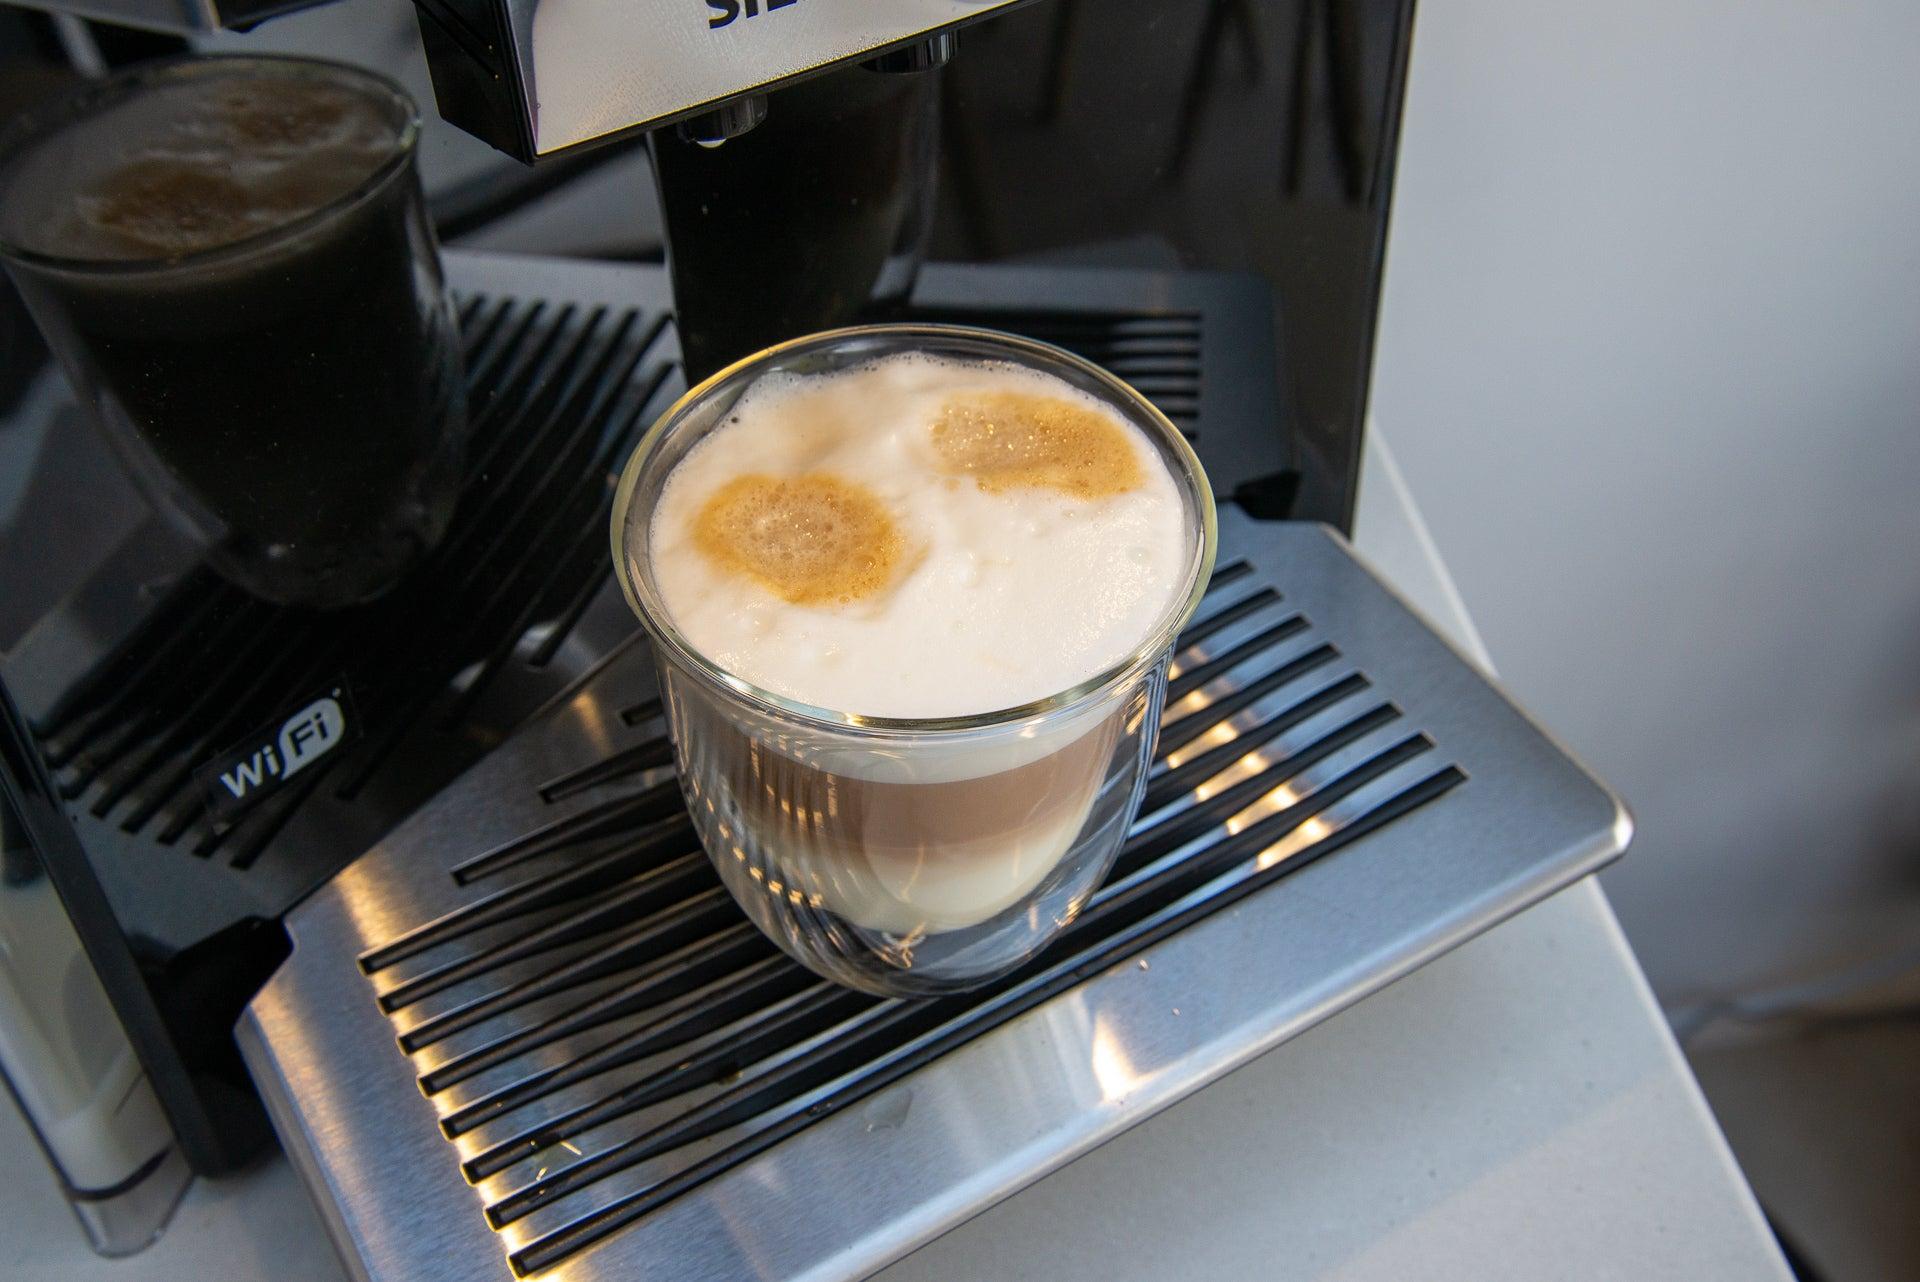 Siemens EQ.9 Plus Connect cappuccino